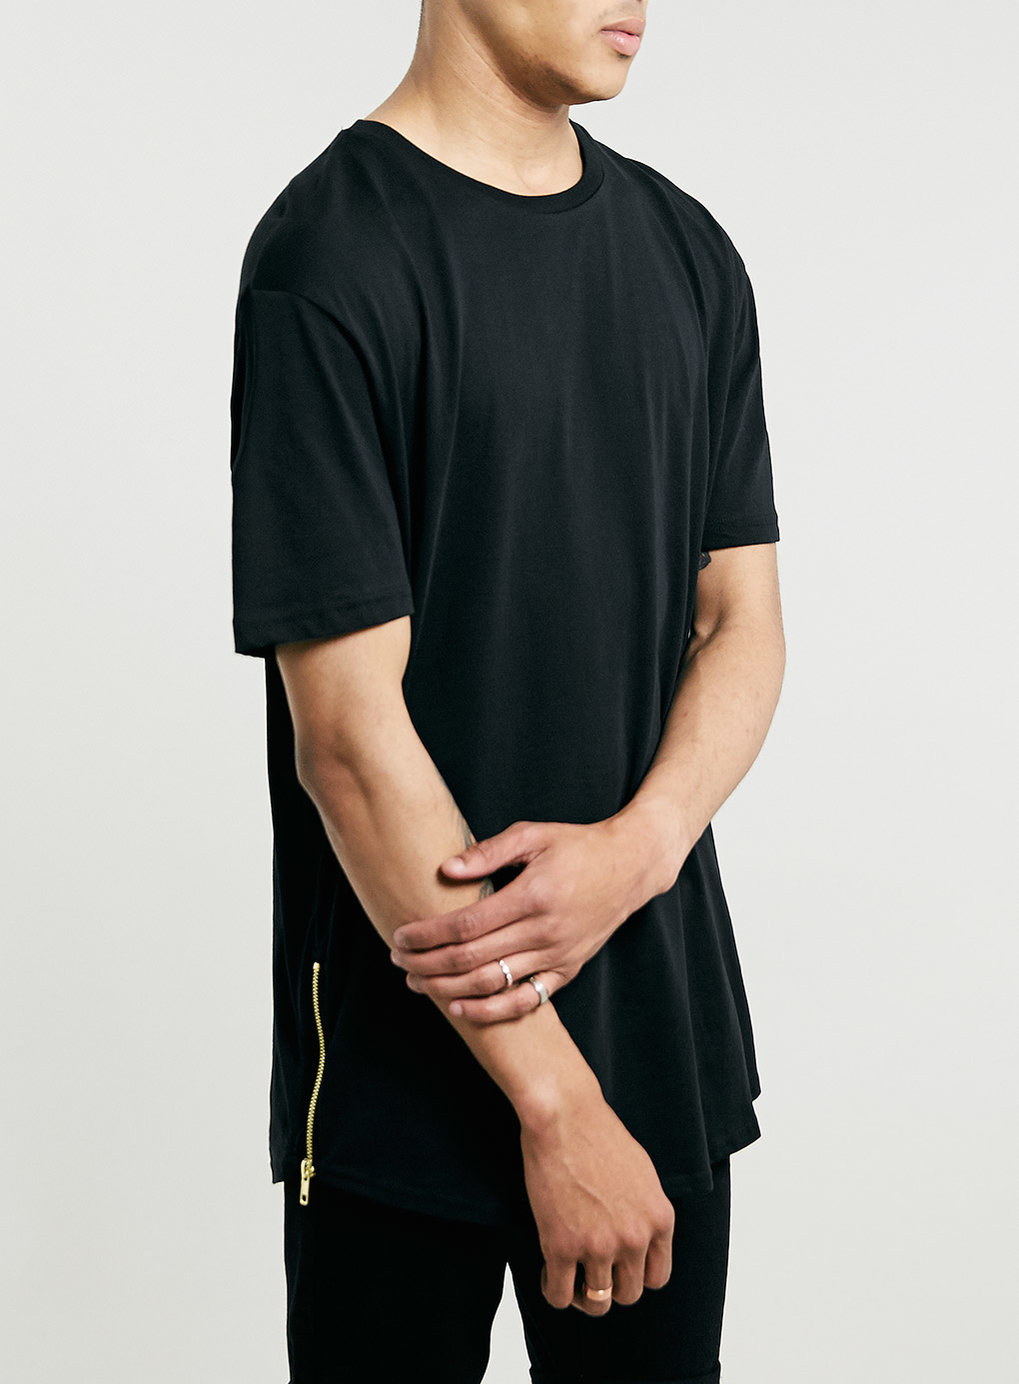 Black t shirt with zipper black zips skater t shirt men s t shirts vests clothing